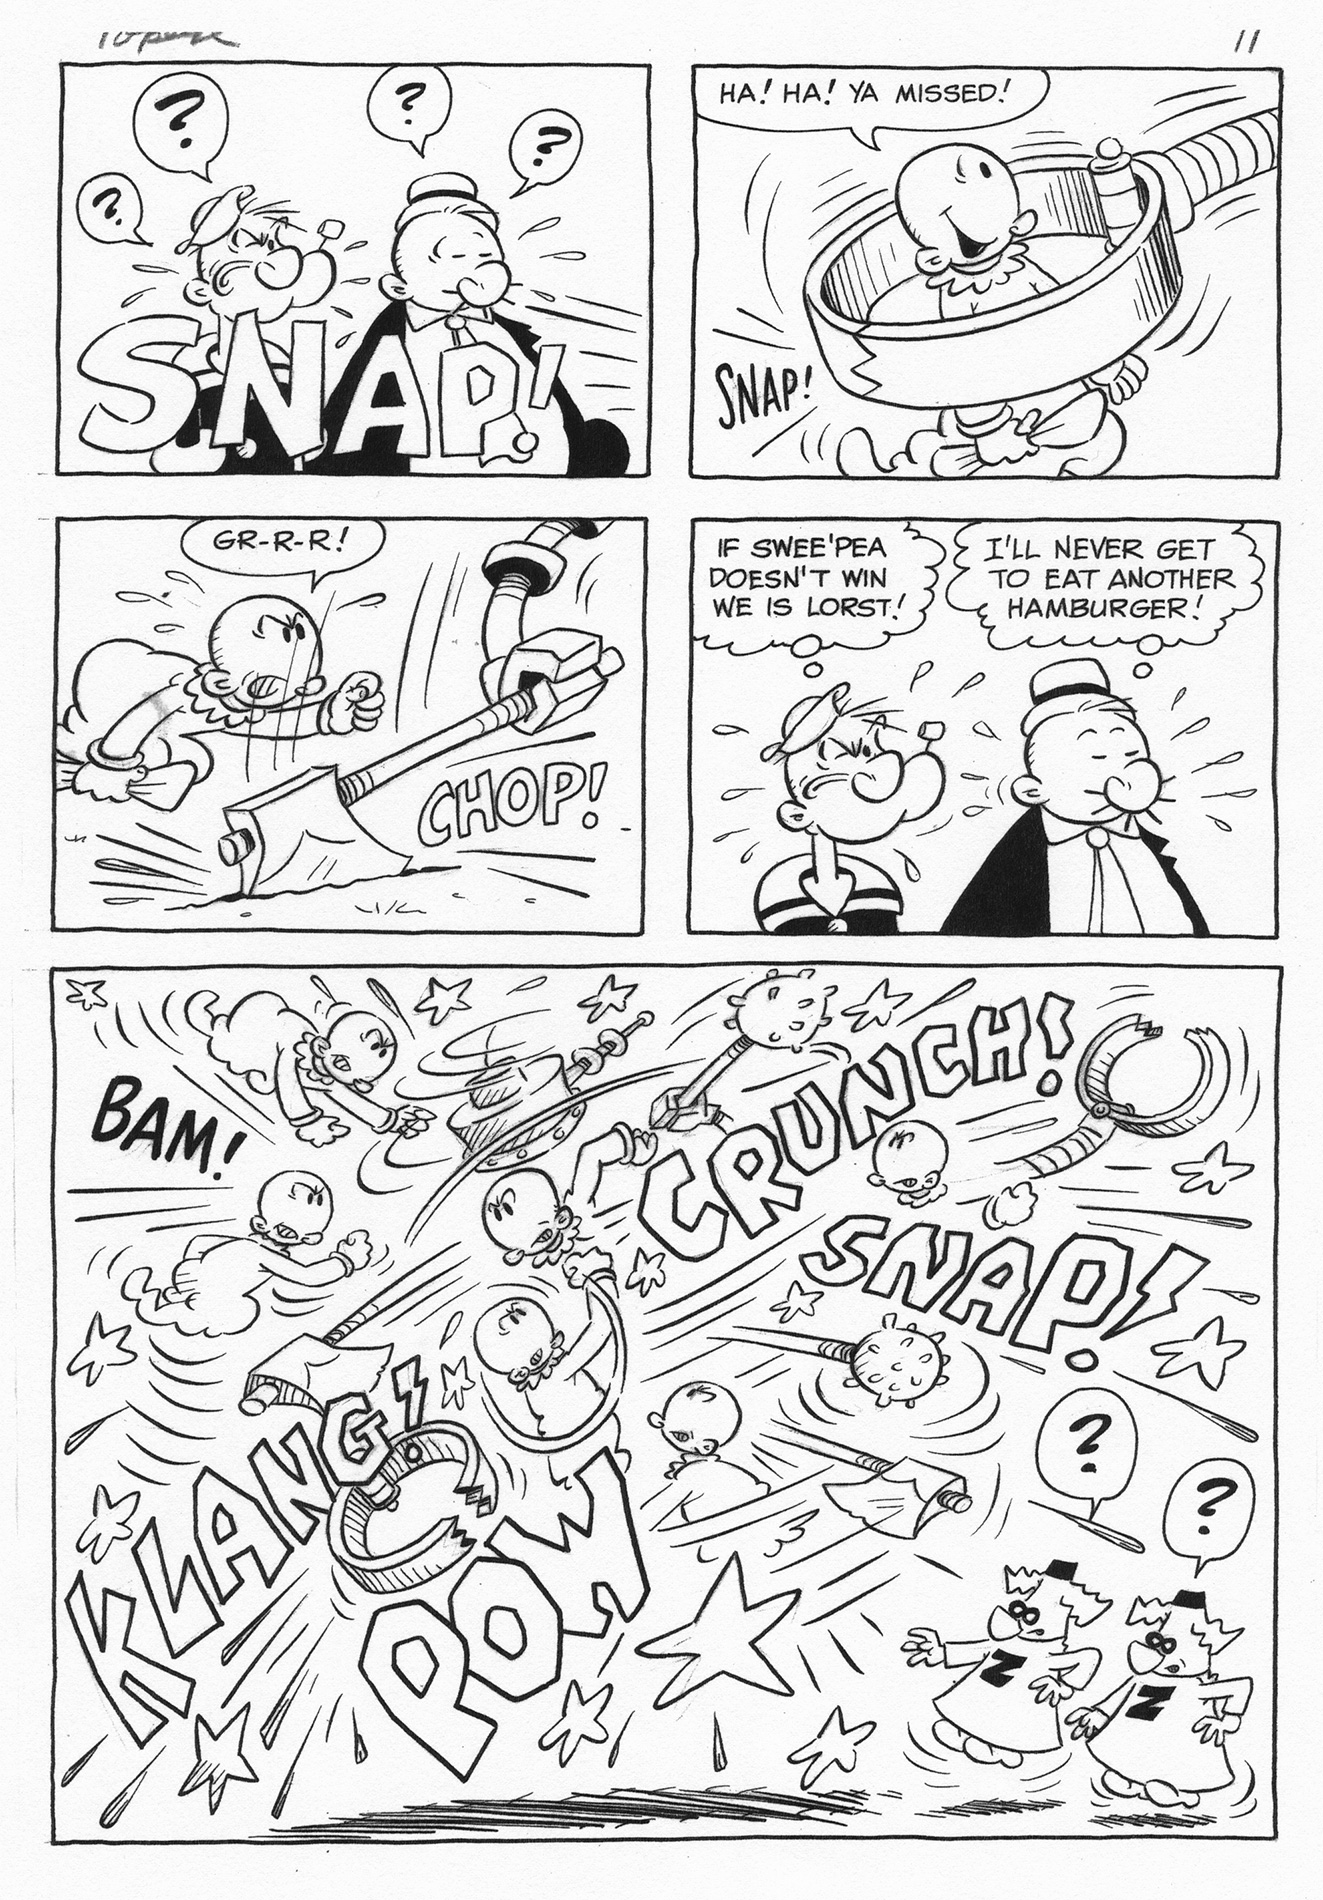 BUD SEGANDORF 1967 POPEYE #85 PG. Comic Art